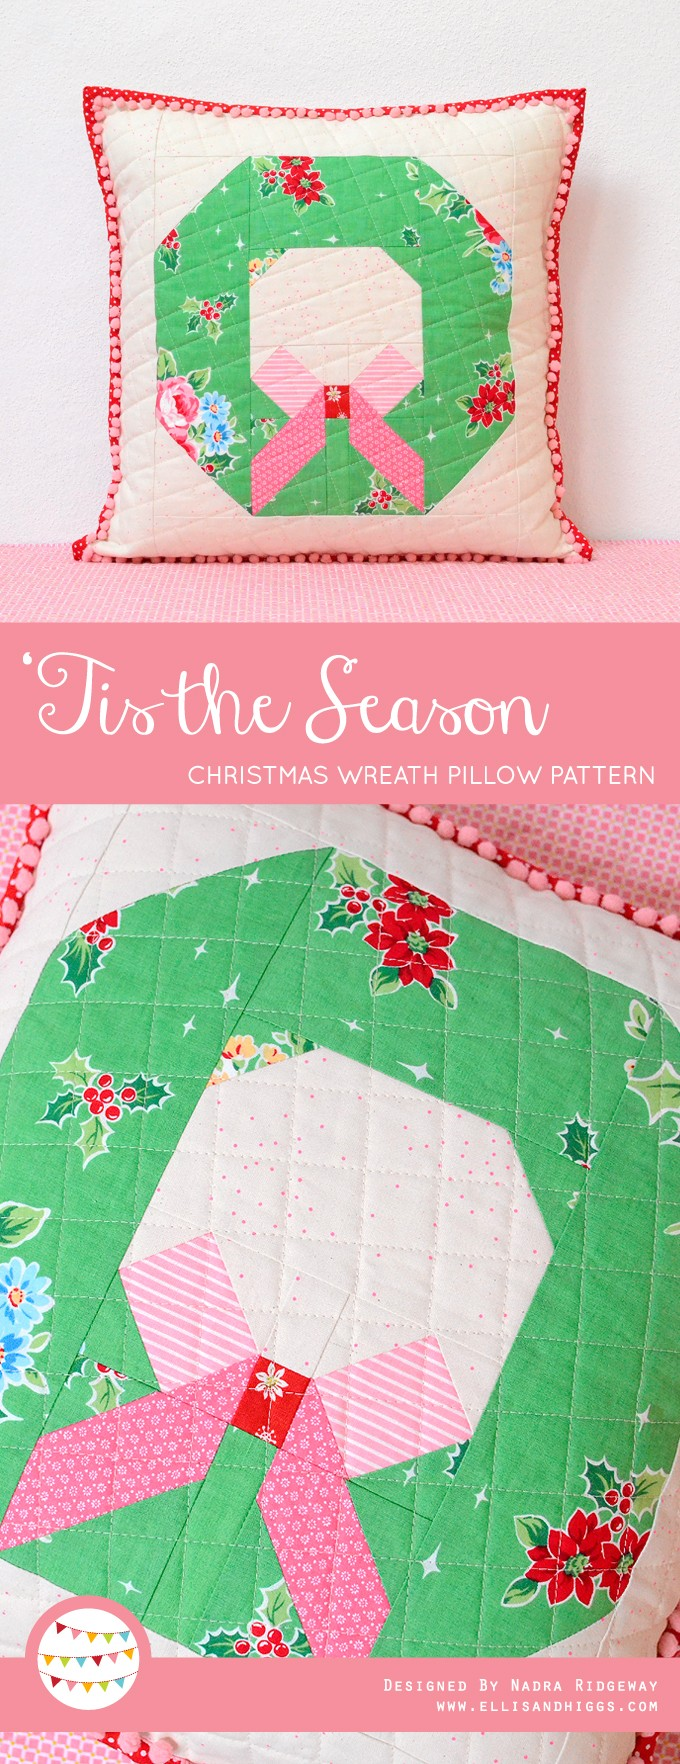 Christmas Wreath Pillow Pattern by Nadra Ridgeway